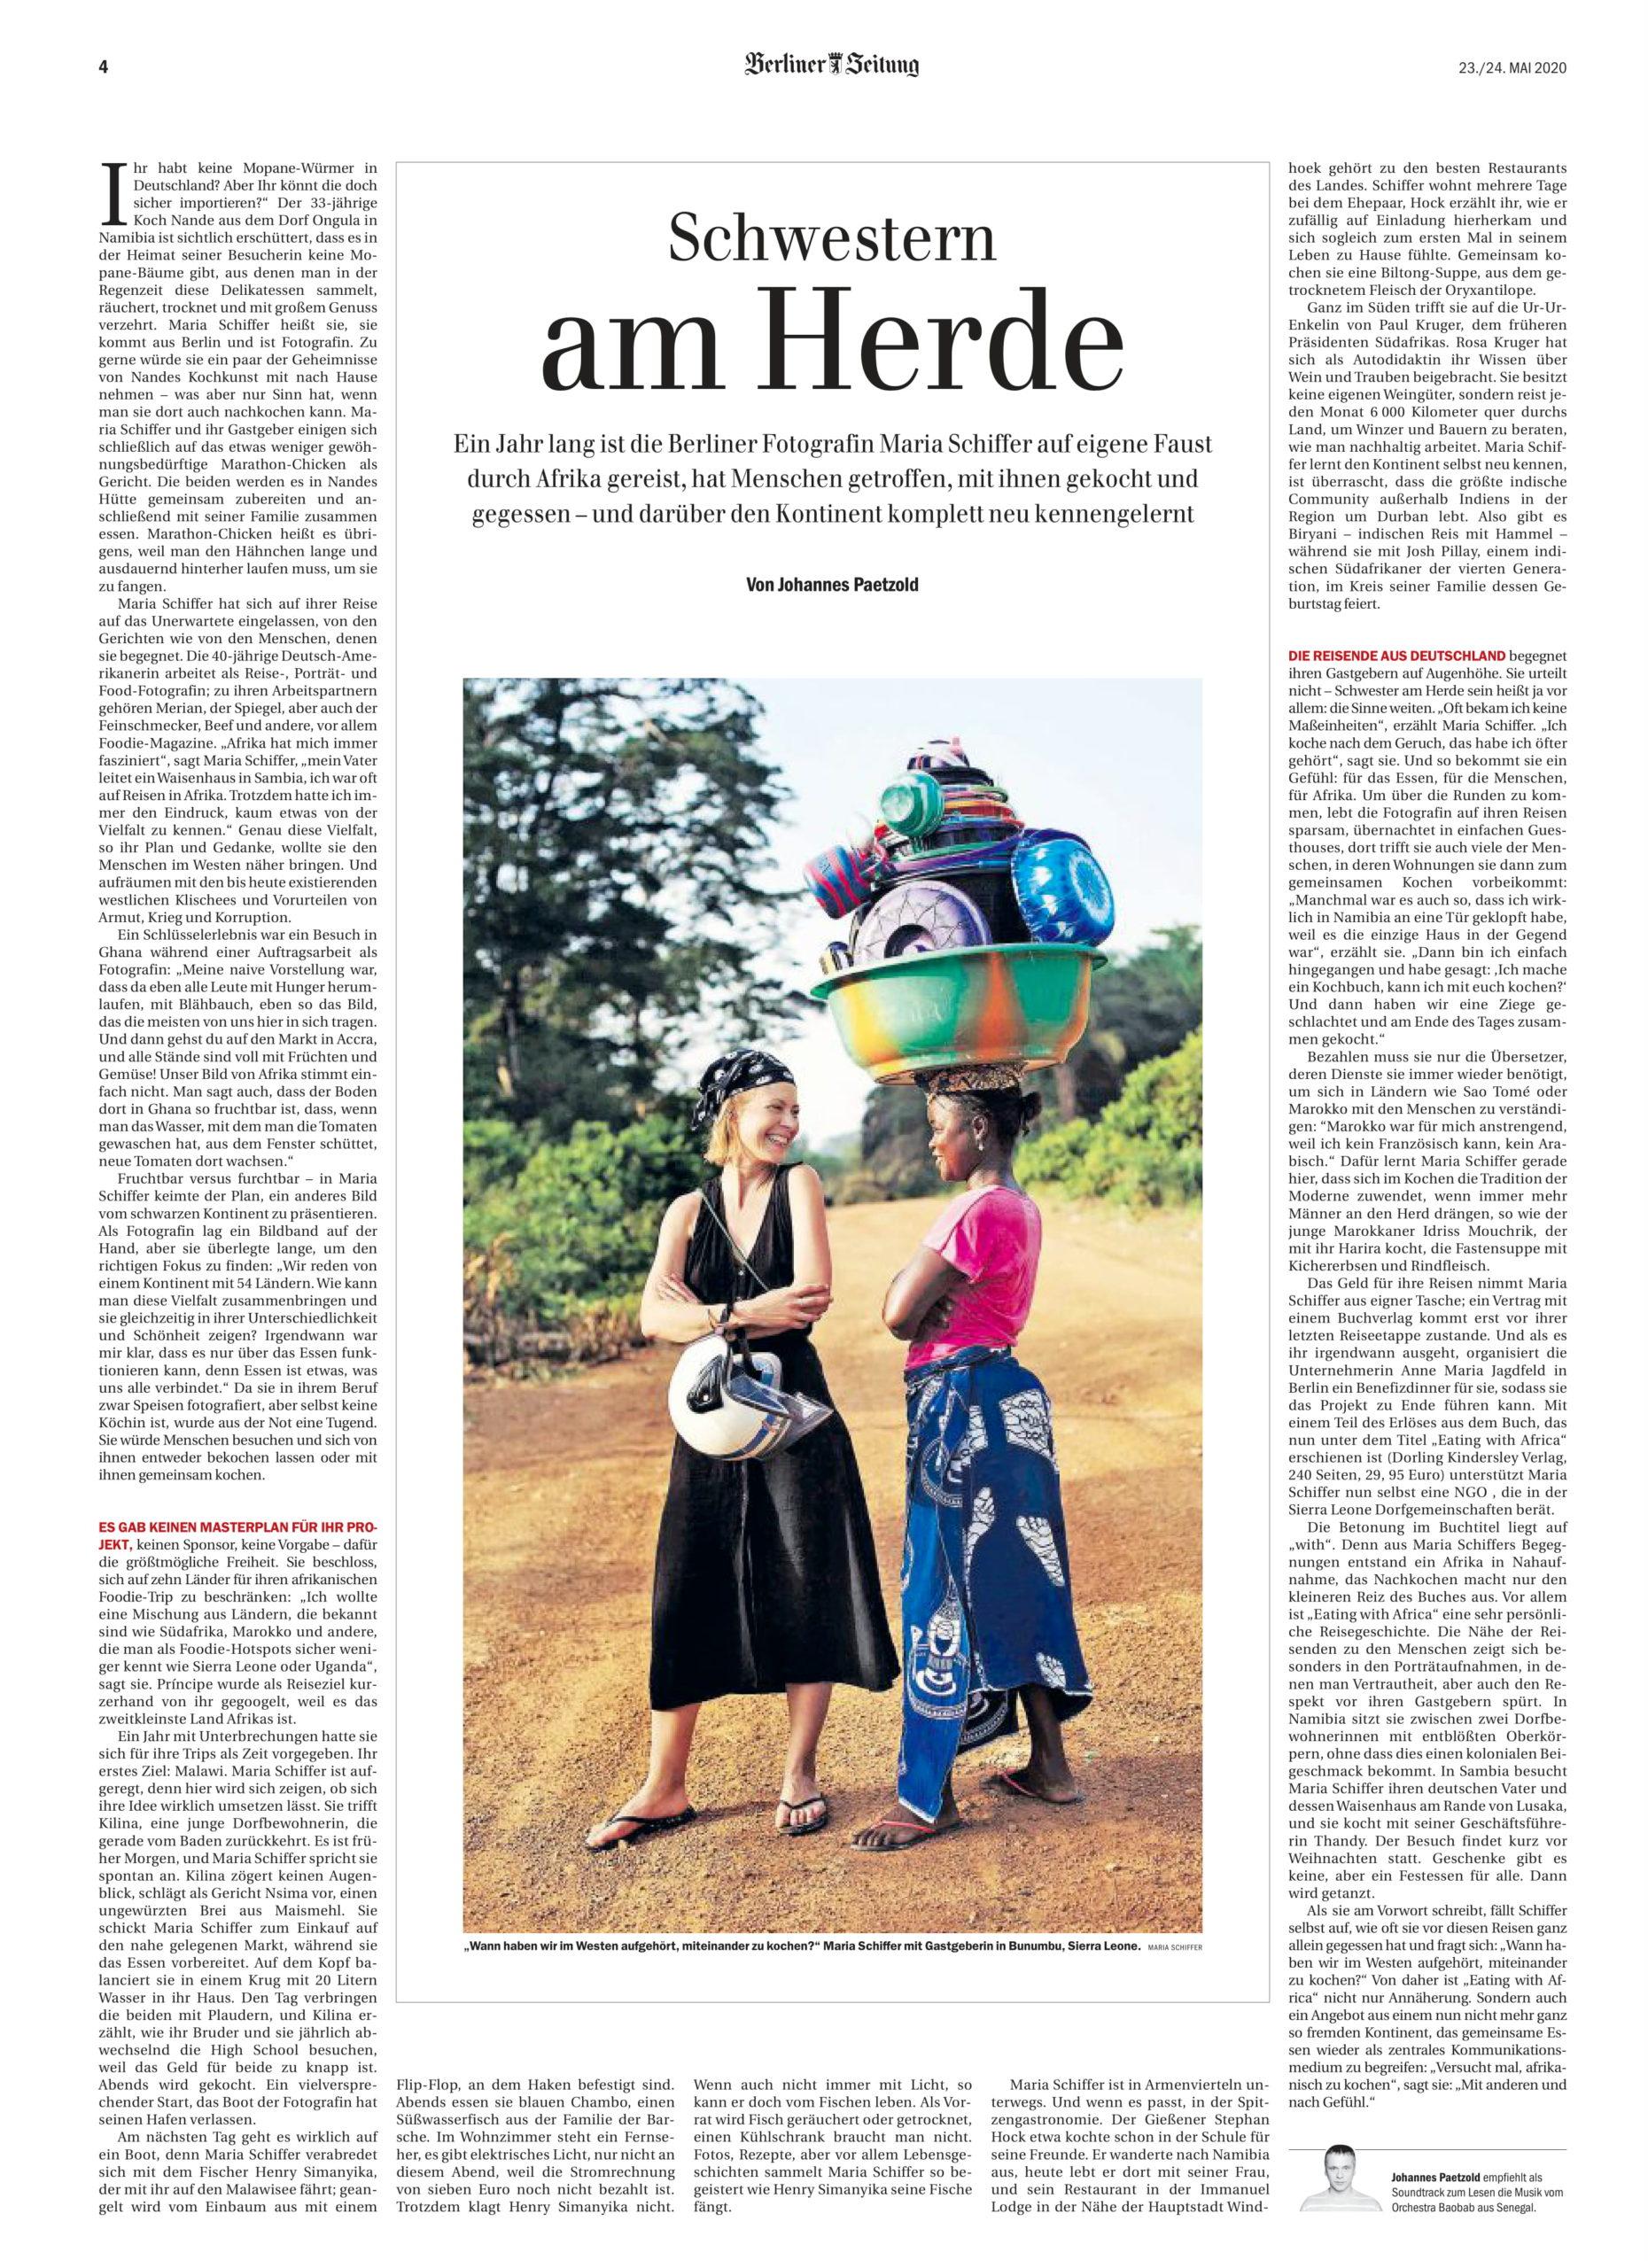 Eating with Africa, Autorin Maria Schiffer, Berliner Zeitung